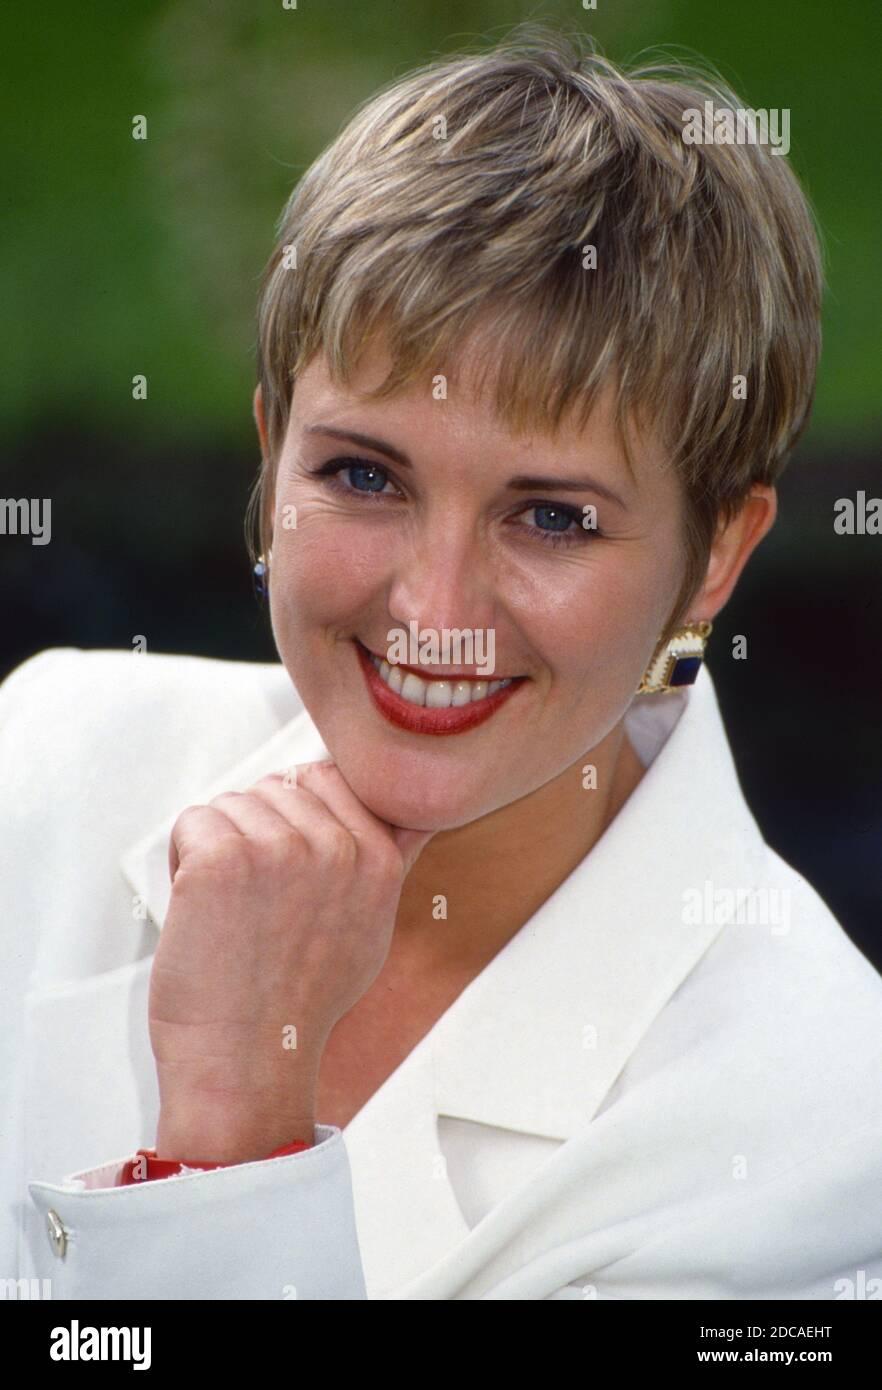 Deutsche schauspielerin schwarze kurze haare